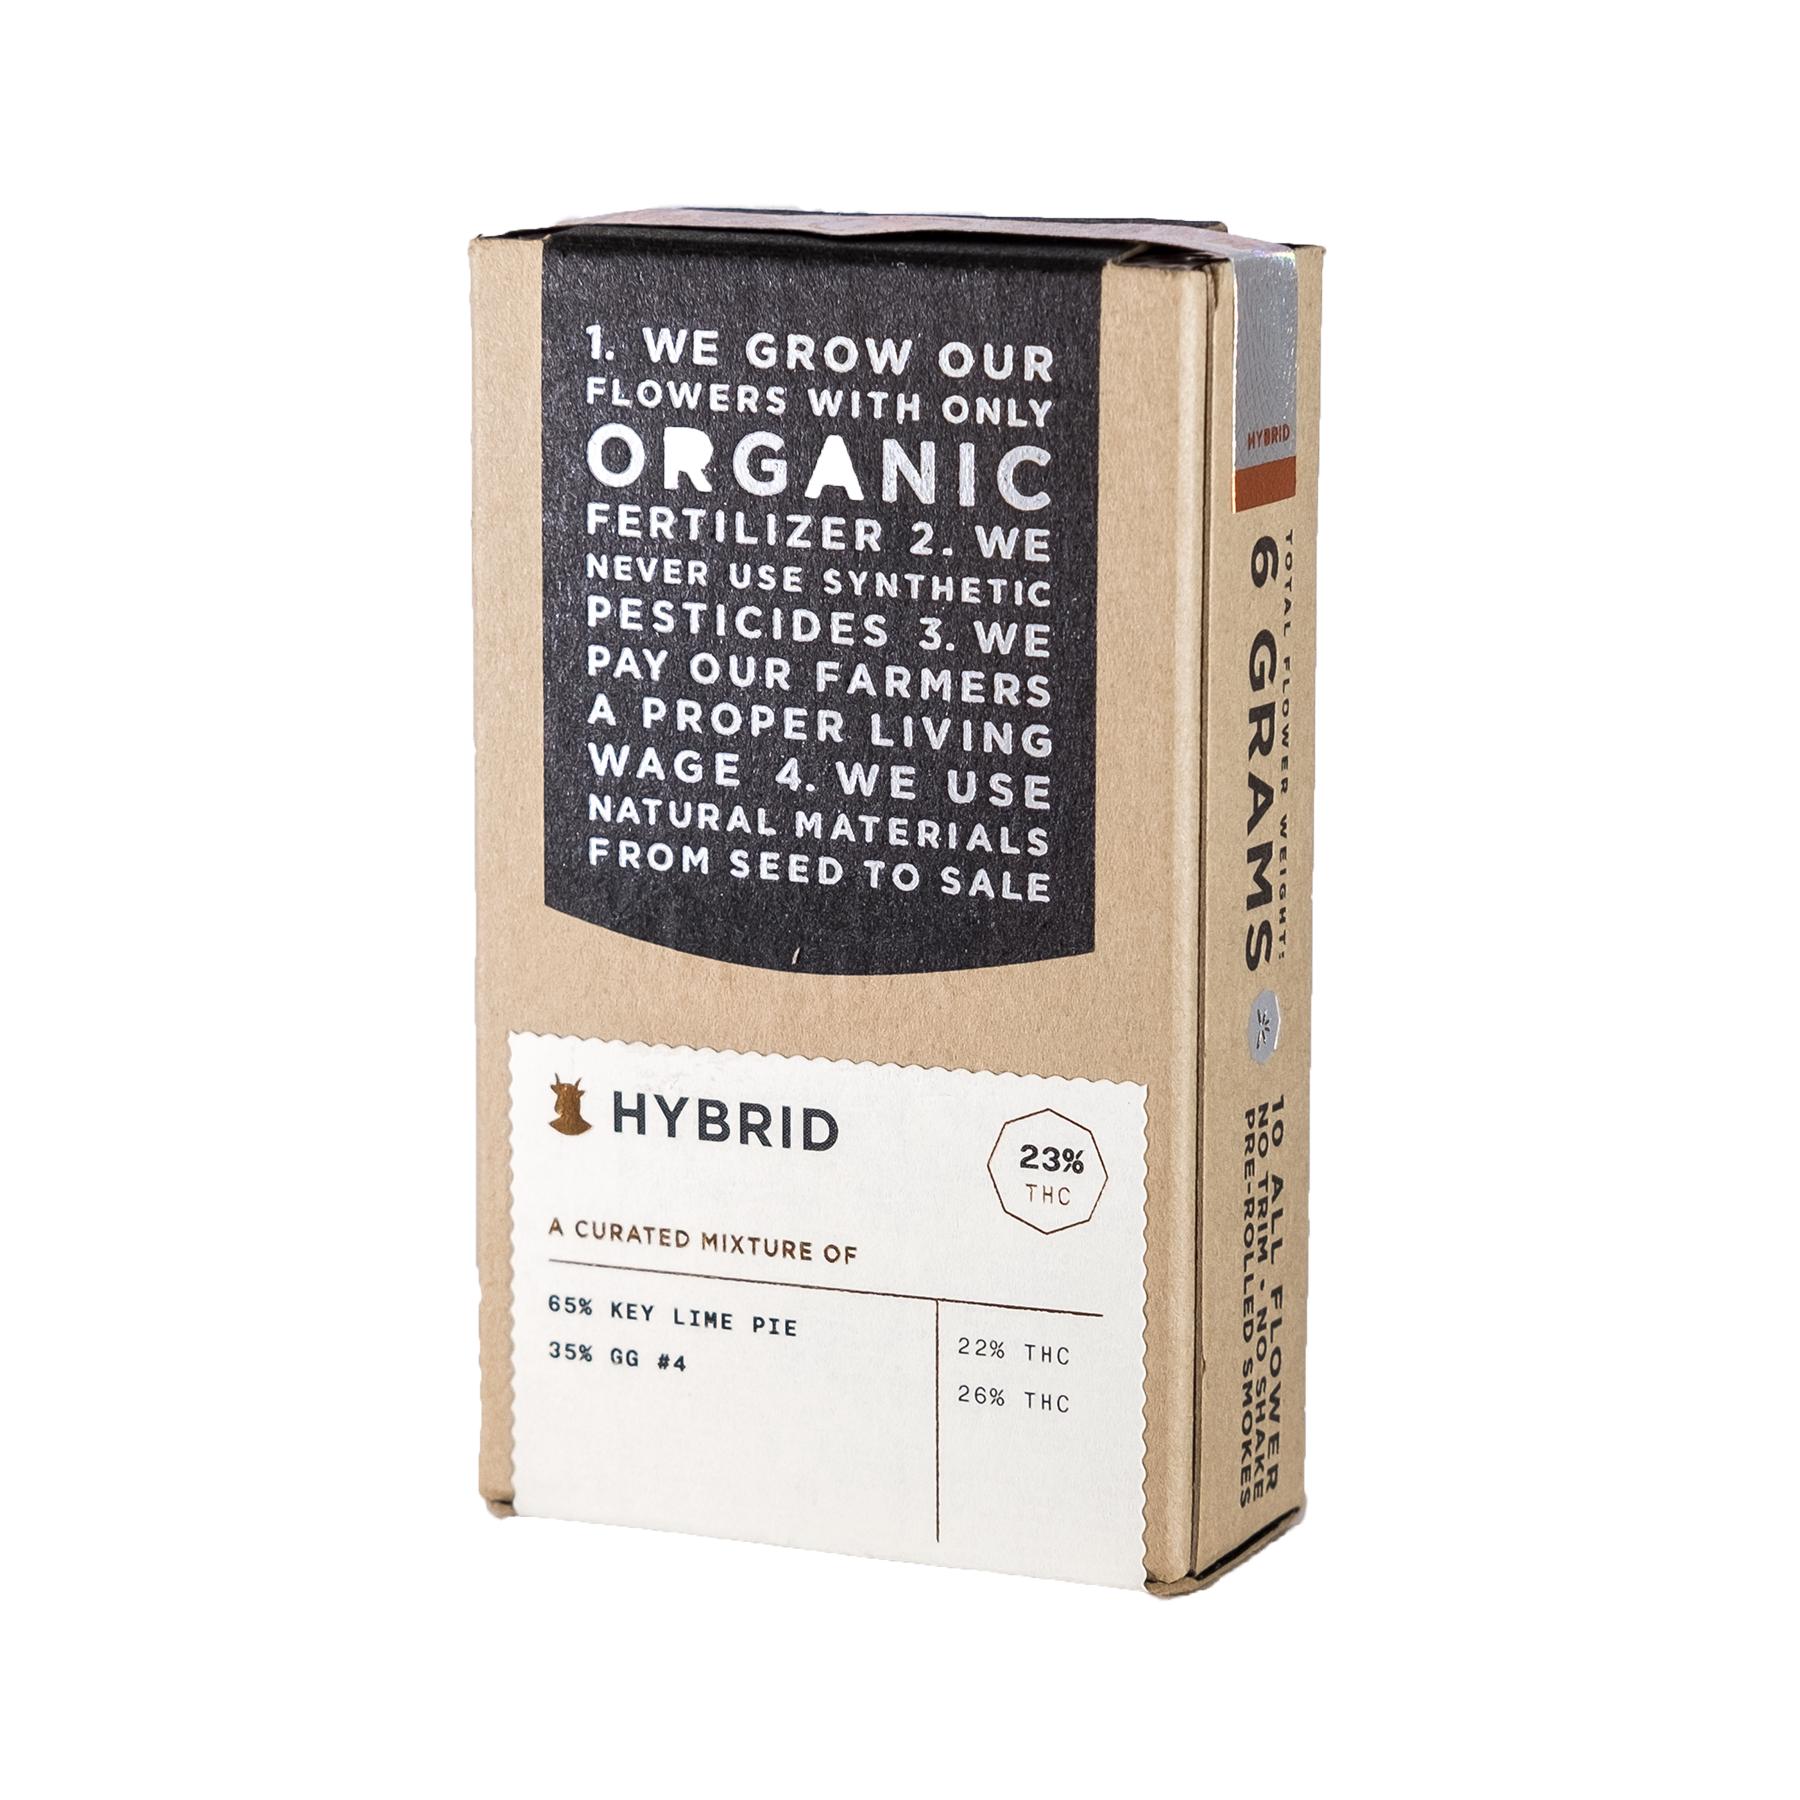 HybridRear.png